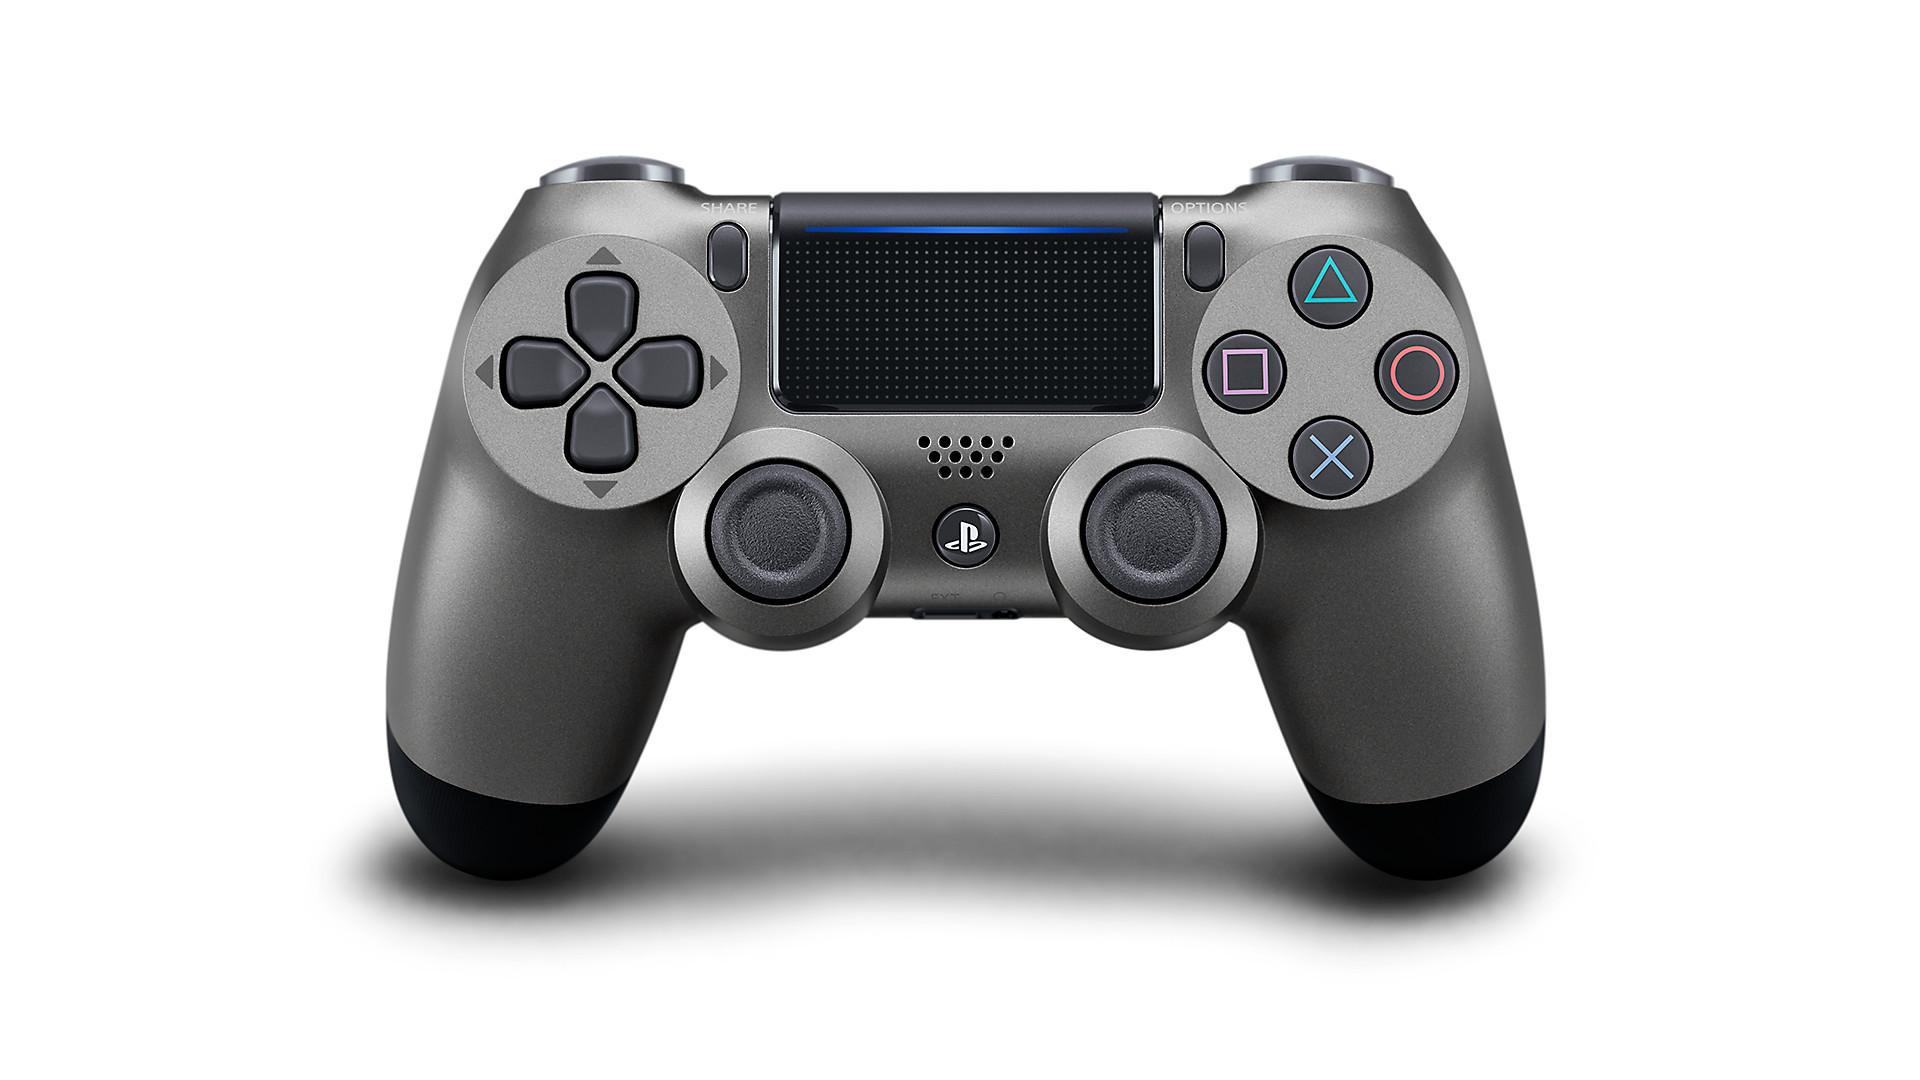 DualShock 4 Wireless Controller - PlayStation